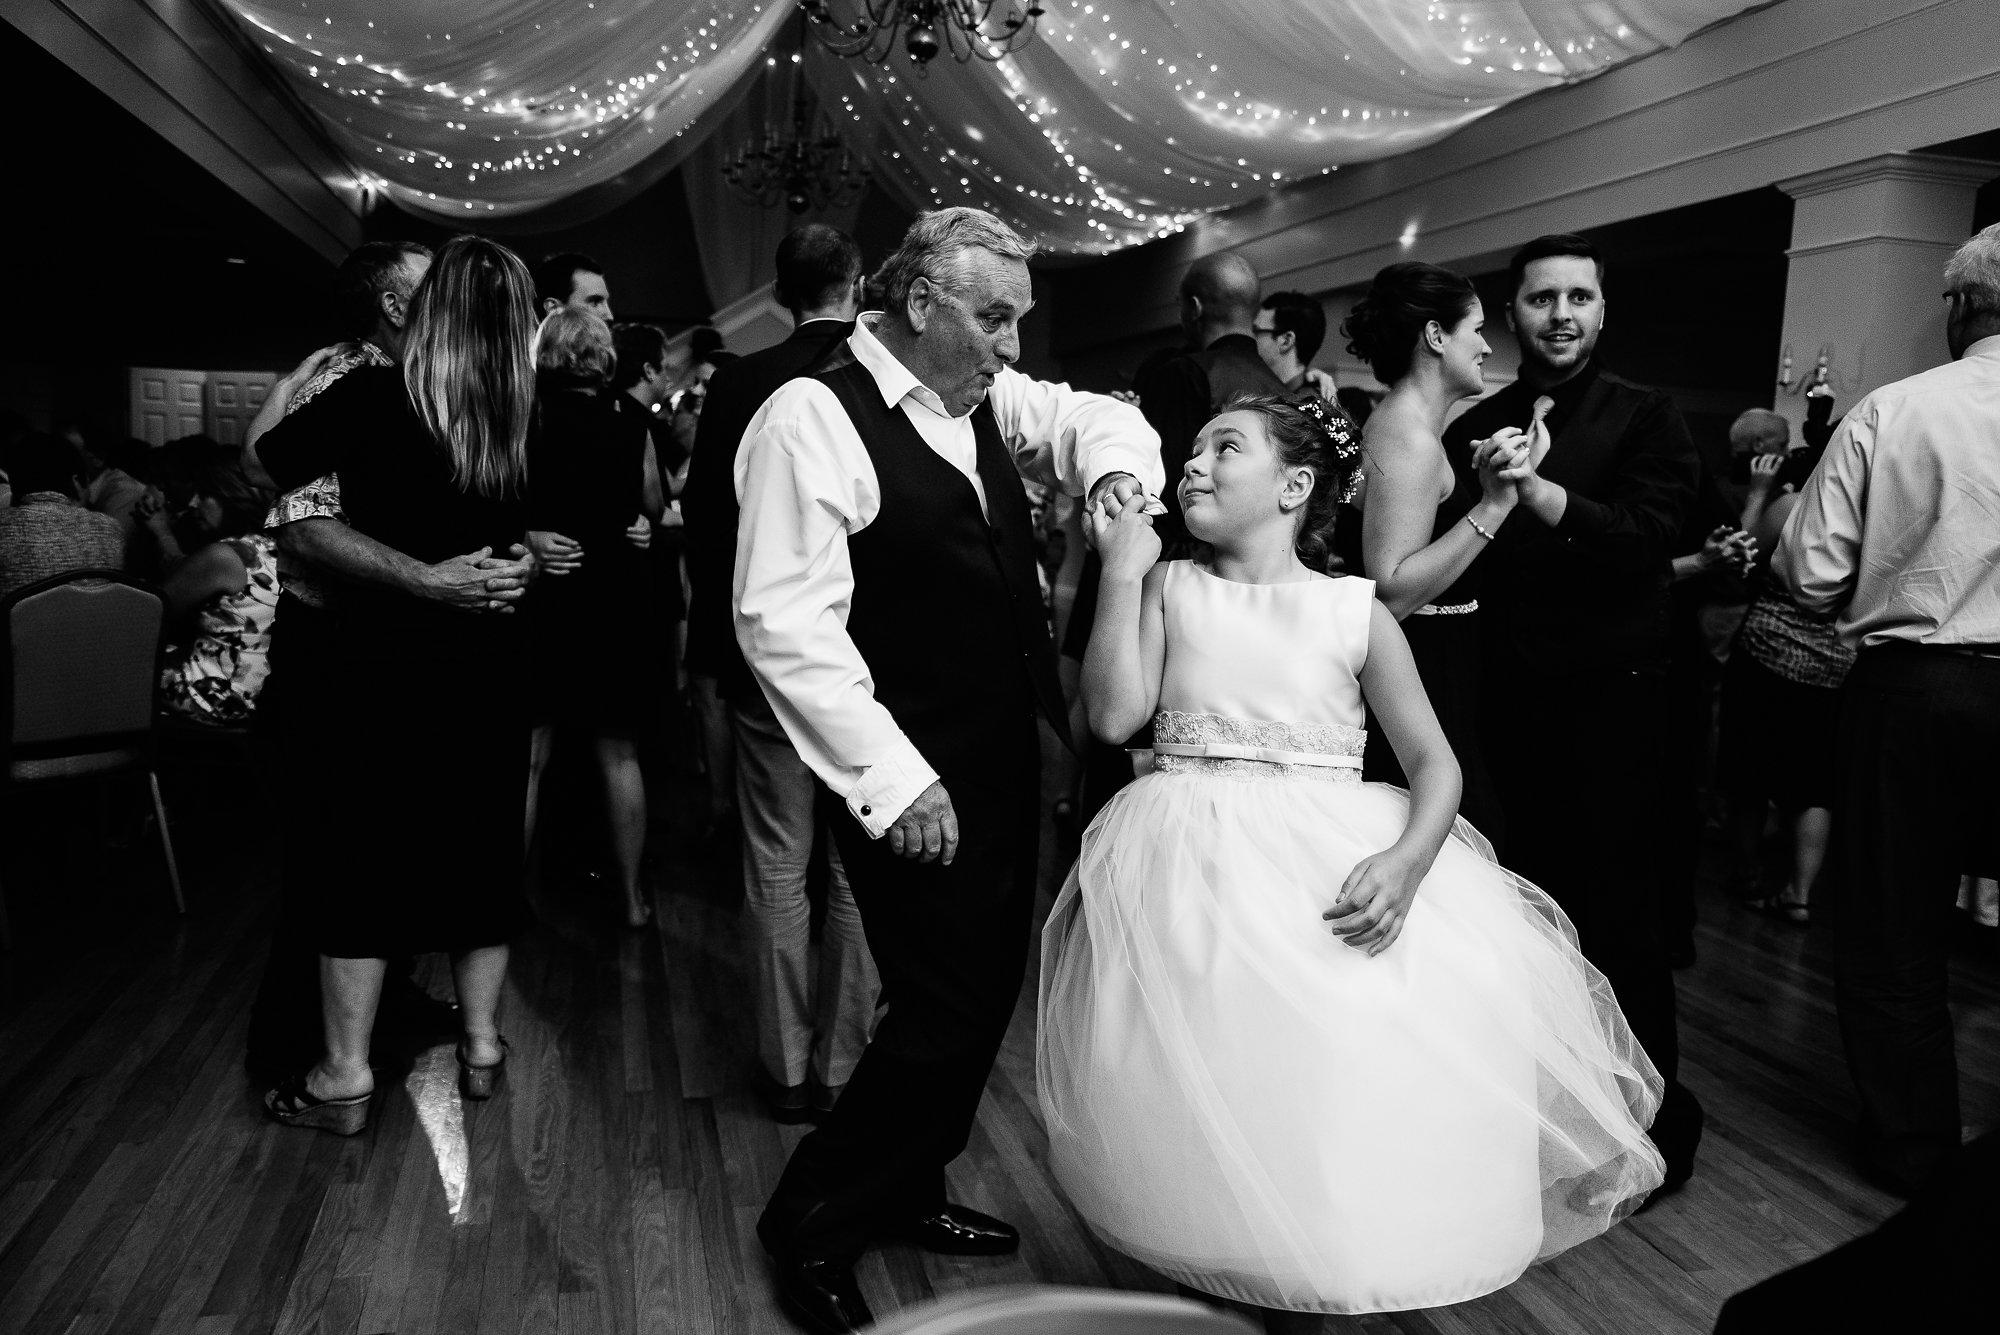 wedding_dancing_fun59.JPG